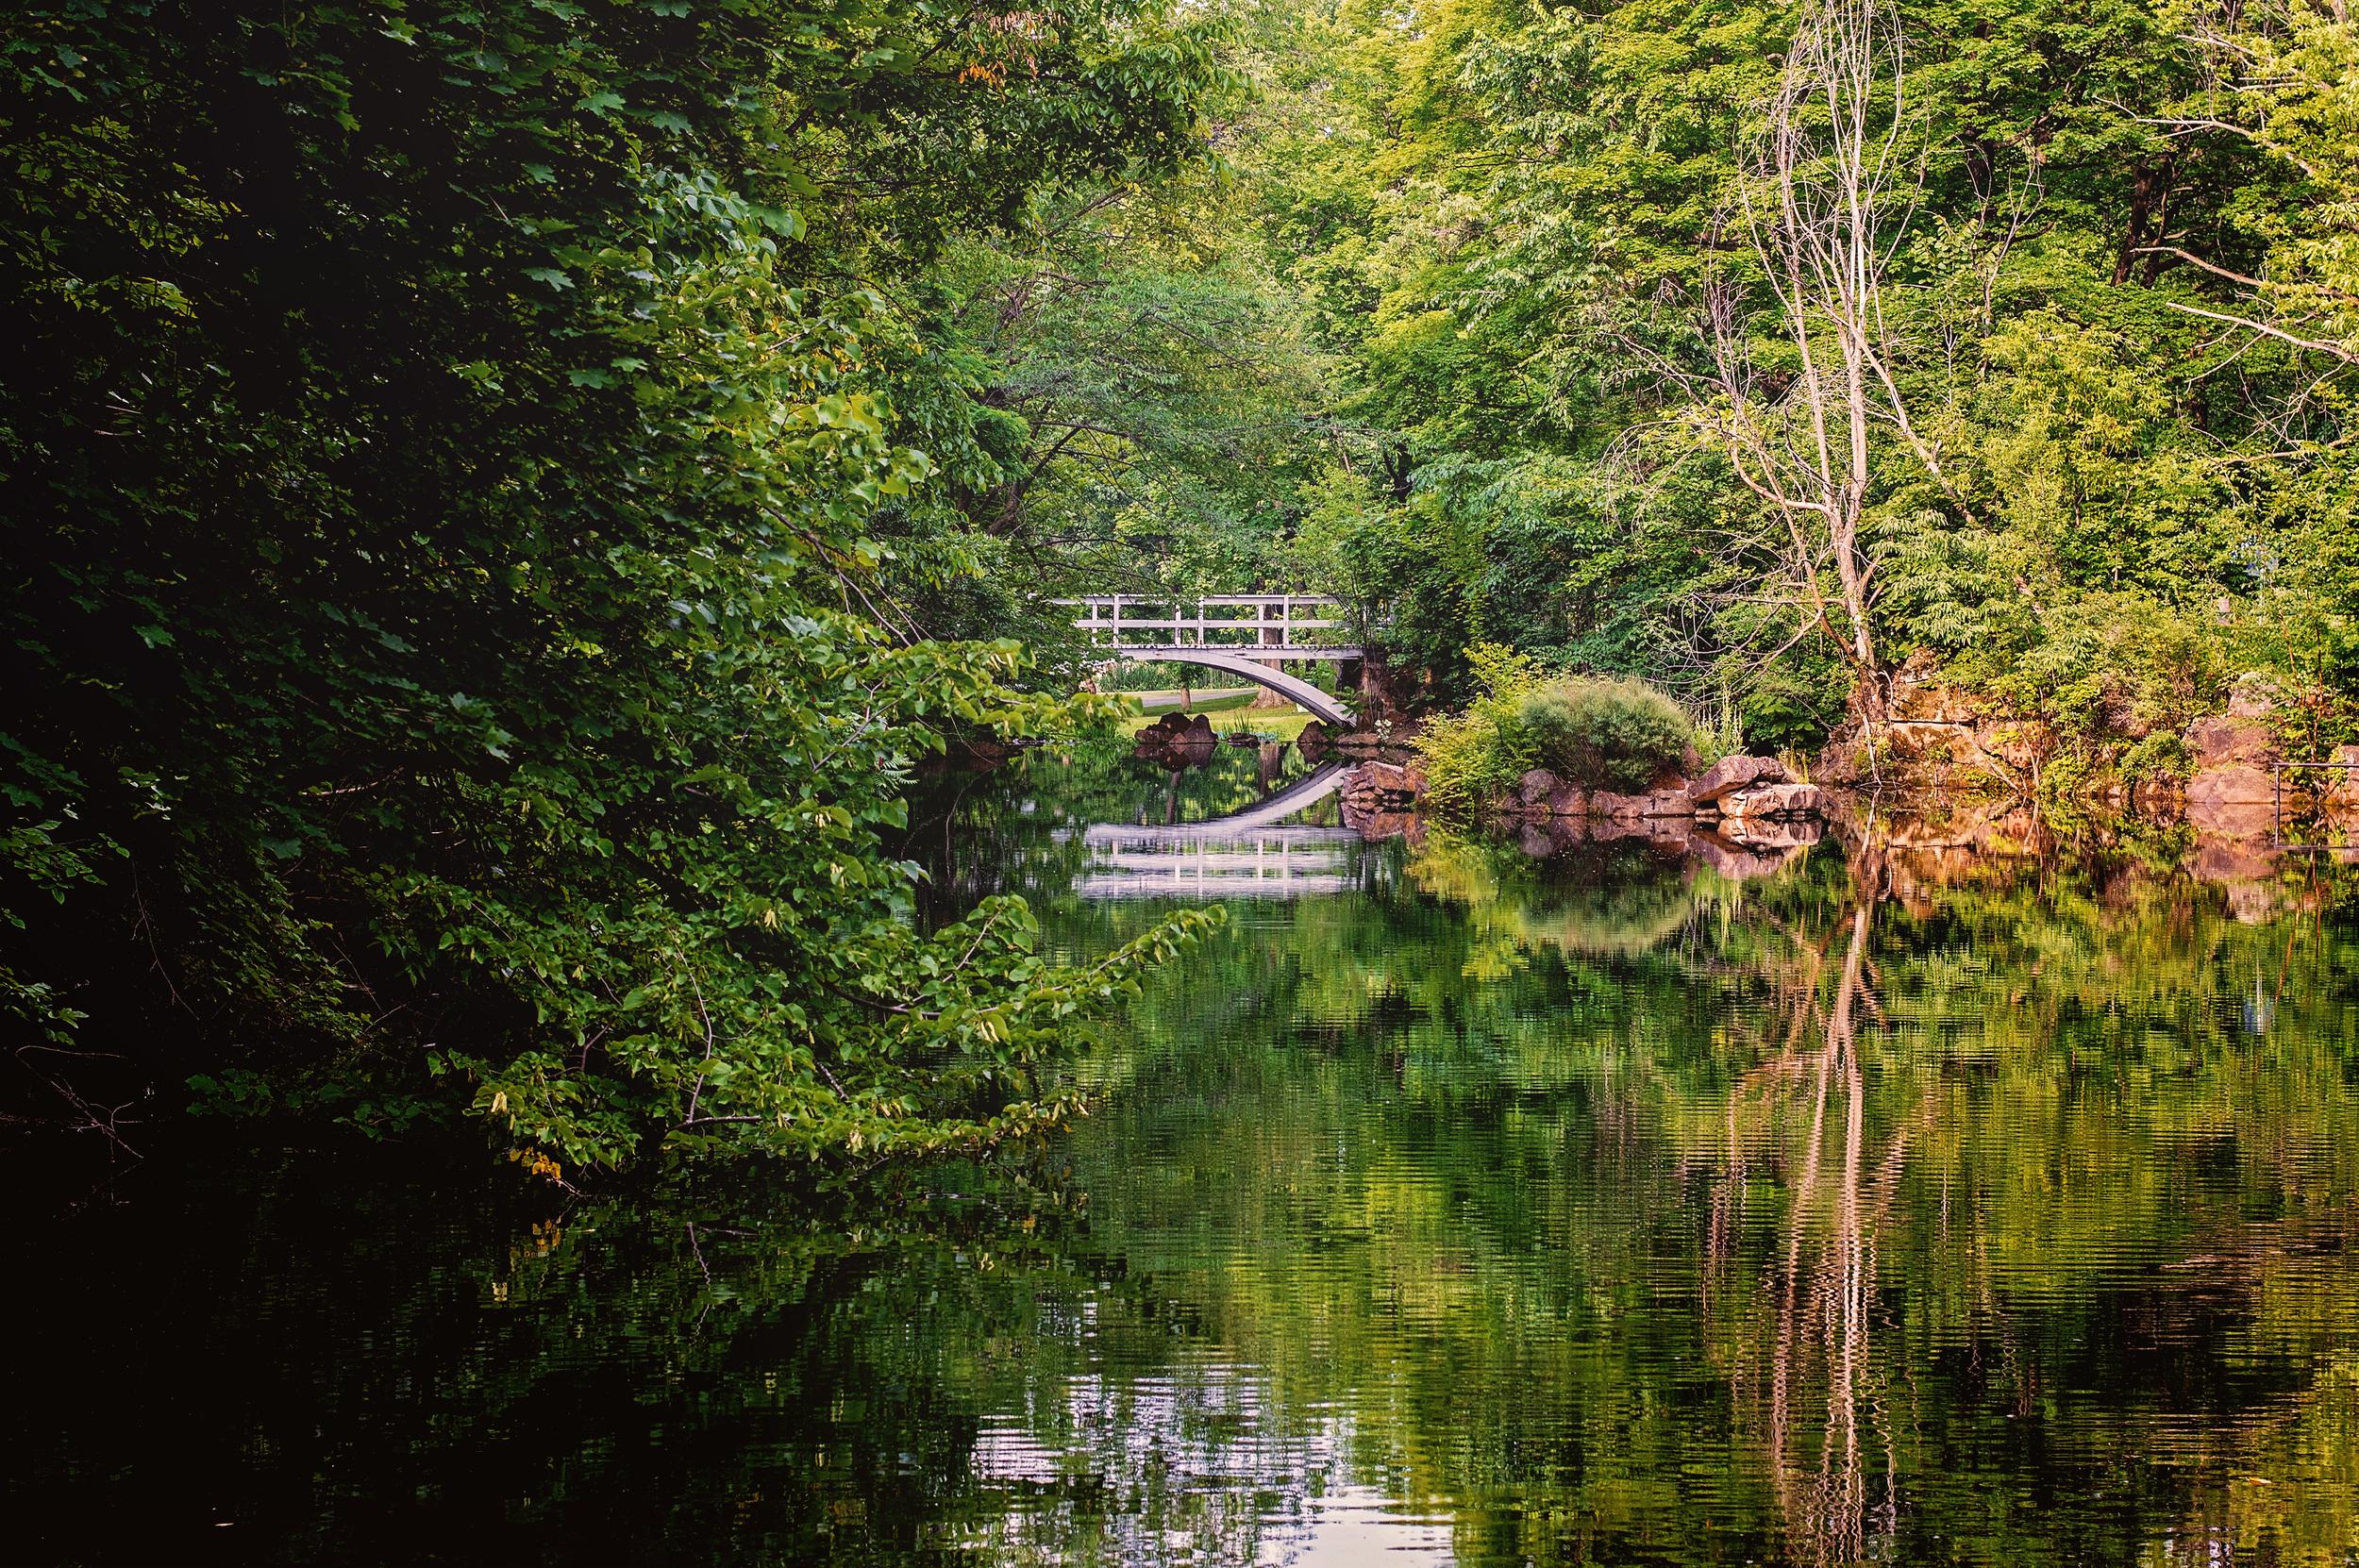 Parc Jean-Drapeau © Deena Roth Photography